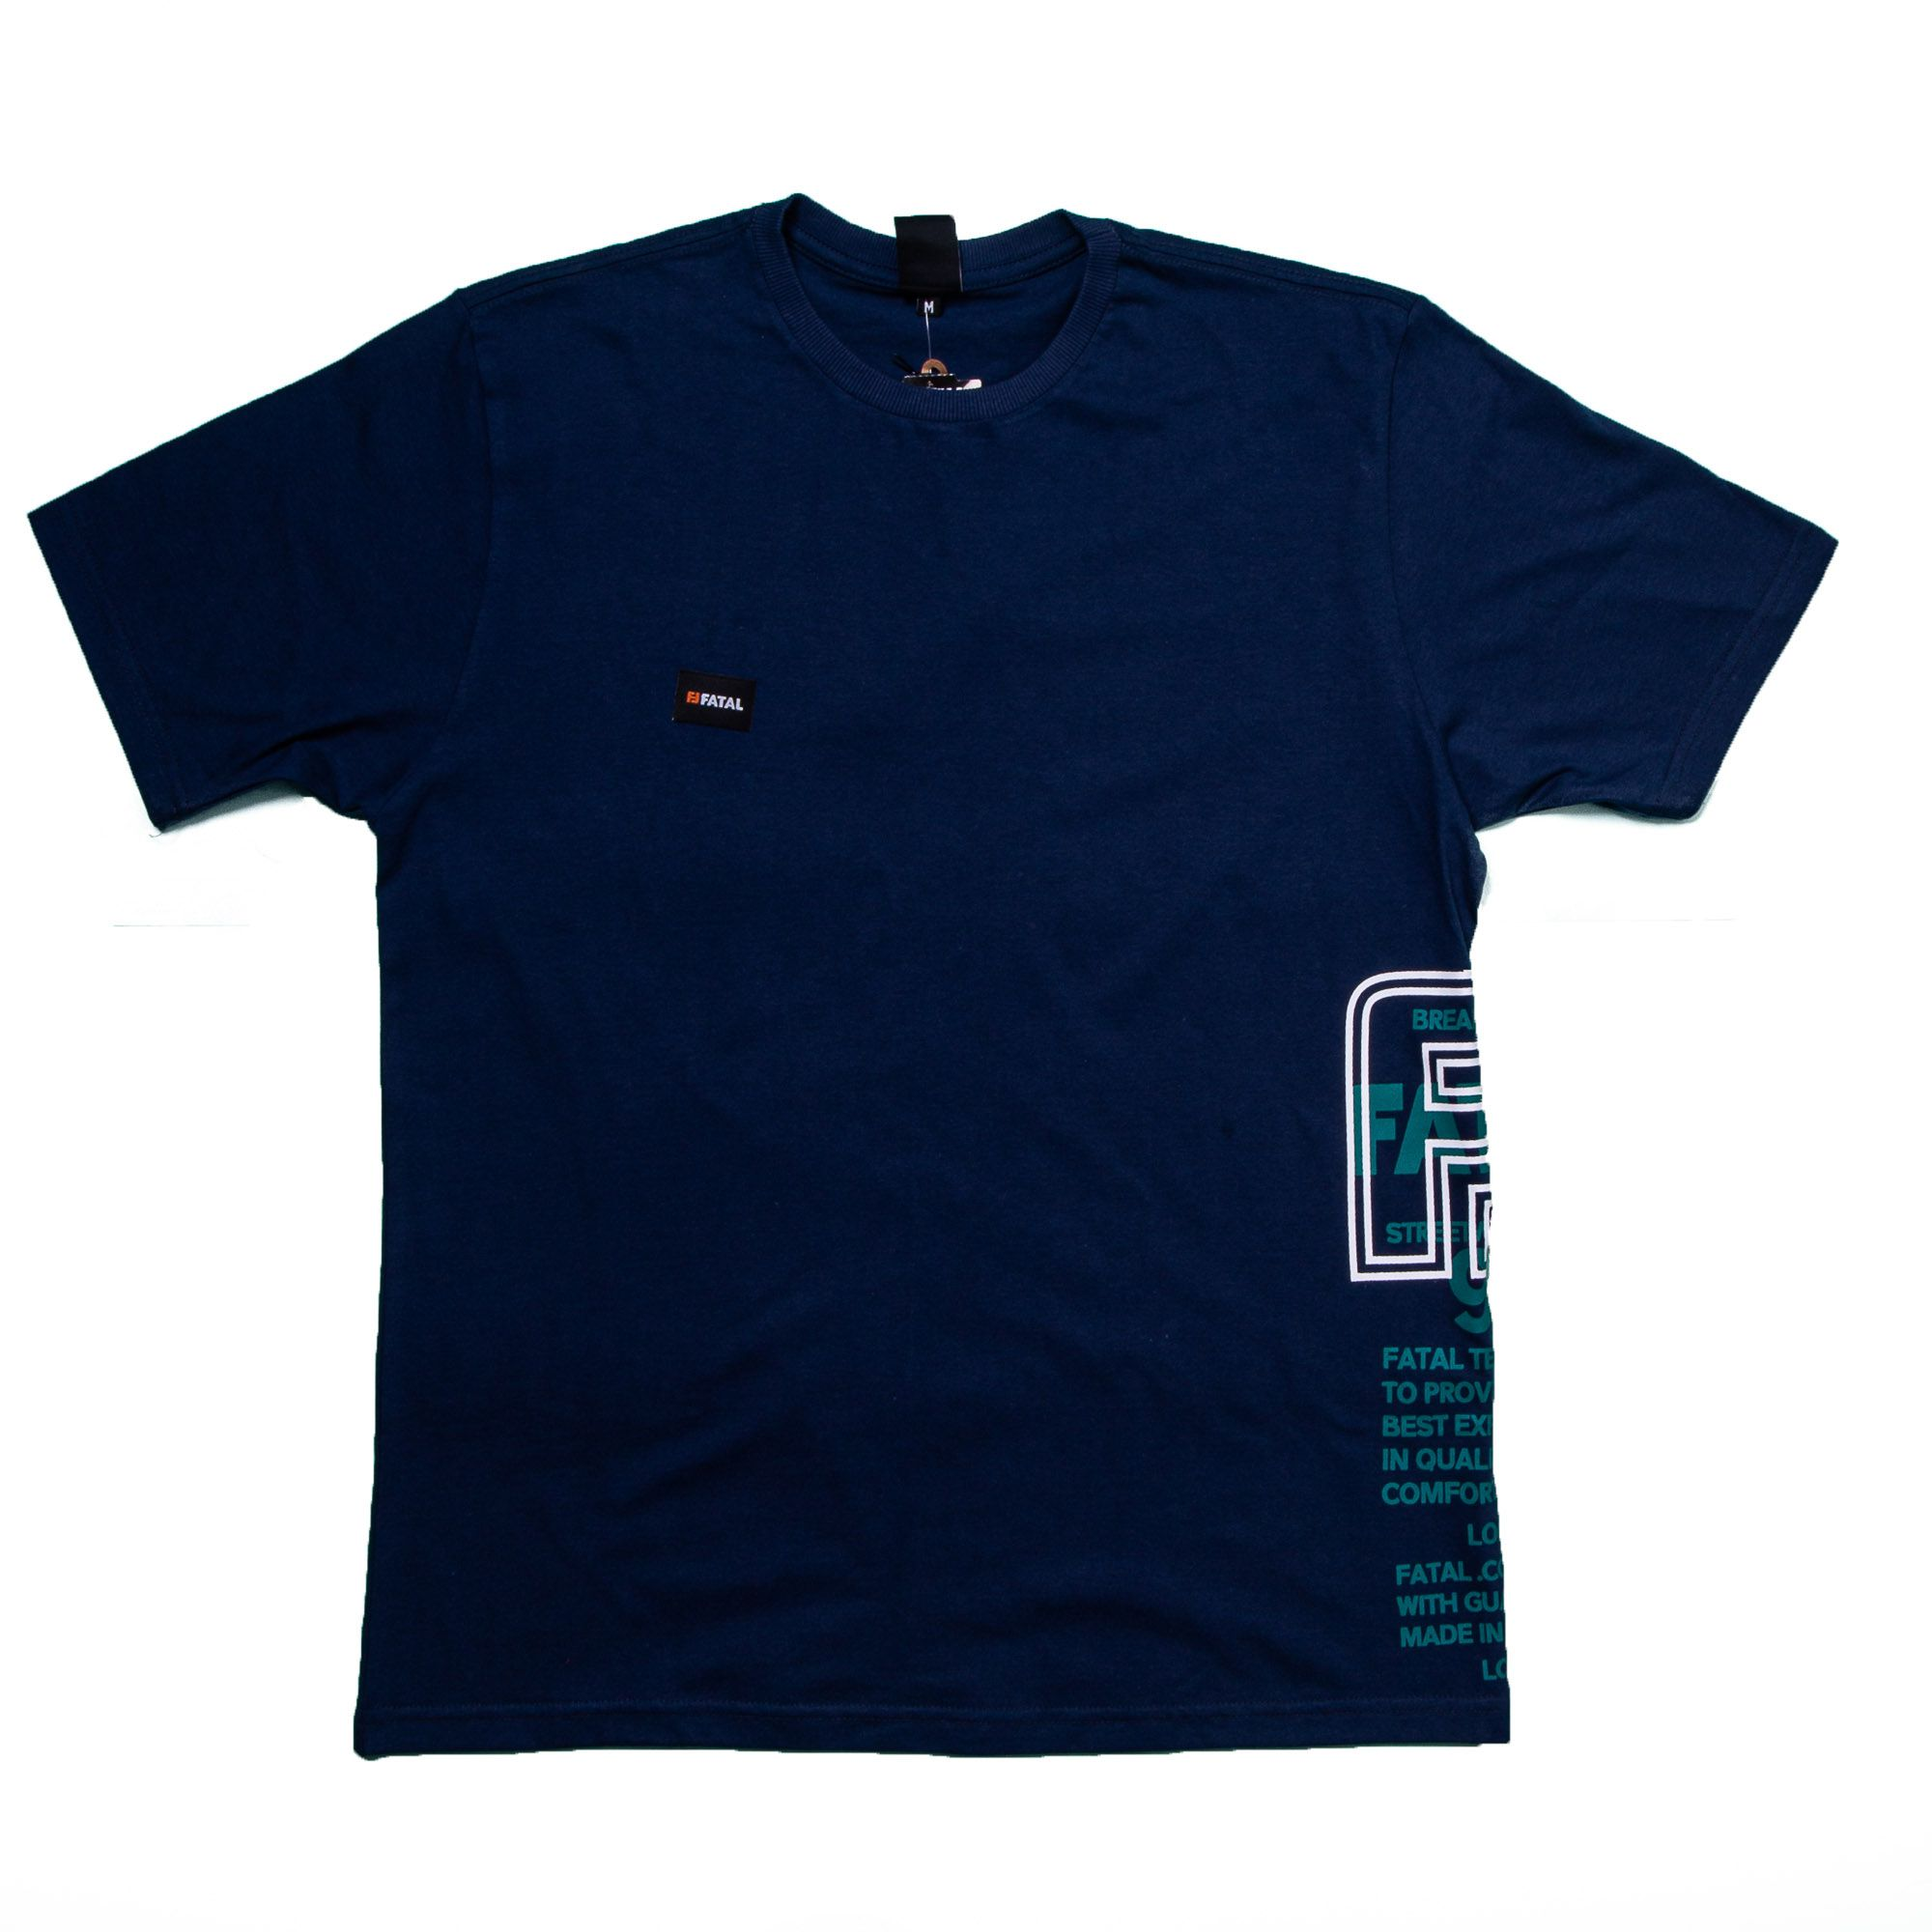 Camiseta Masculina Azul Marinho Estampada - Fatal